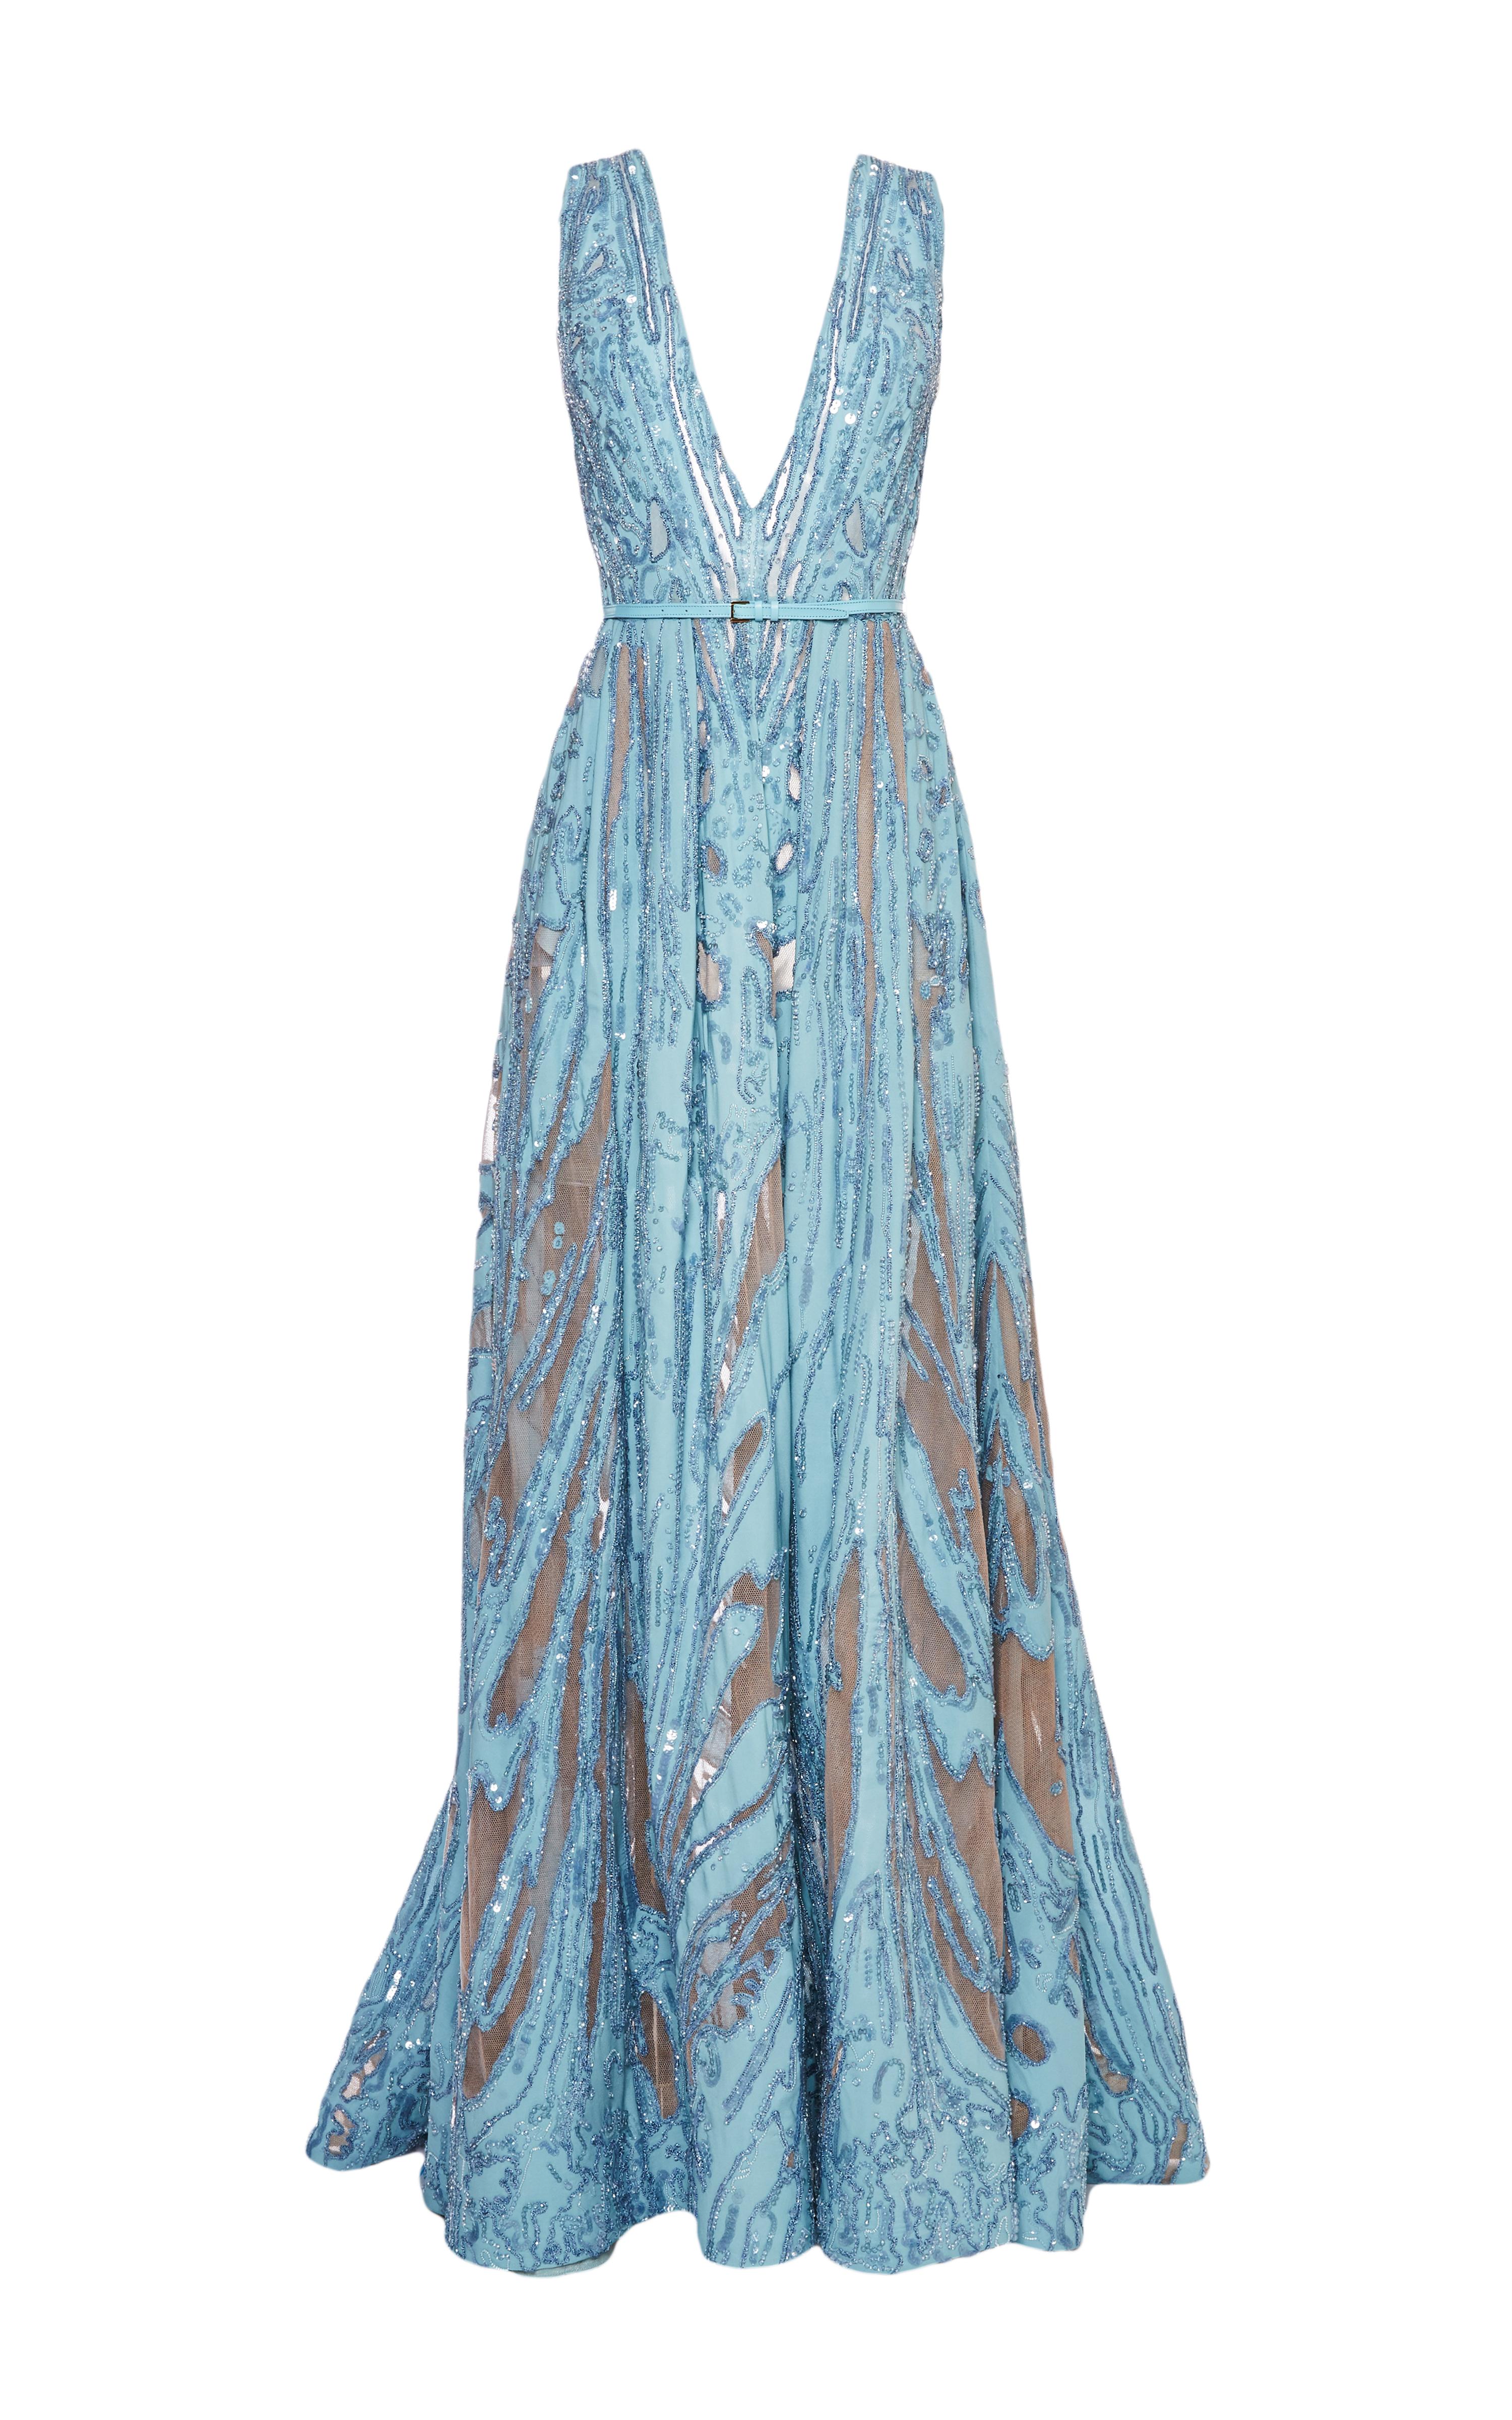 Elie Saab Embroidered Light Blue Double Silk Georgette